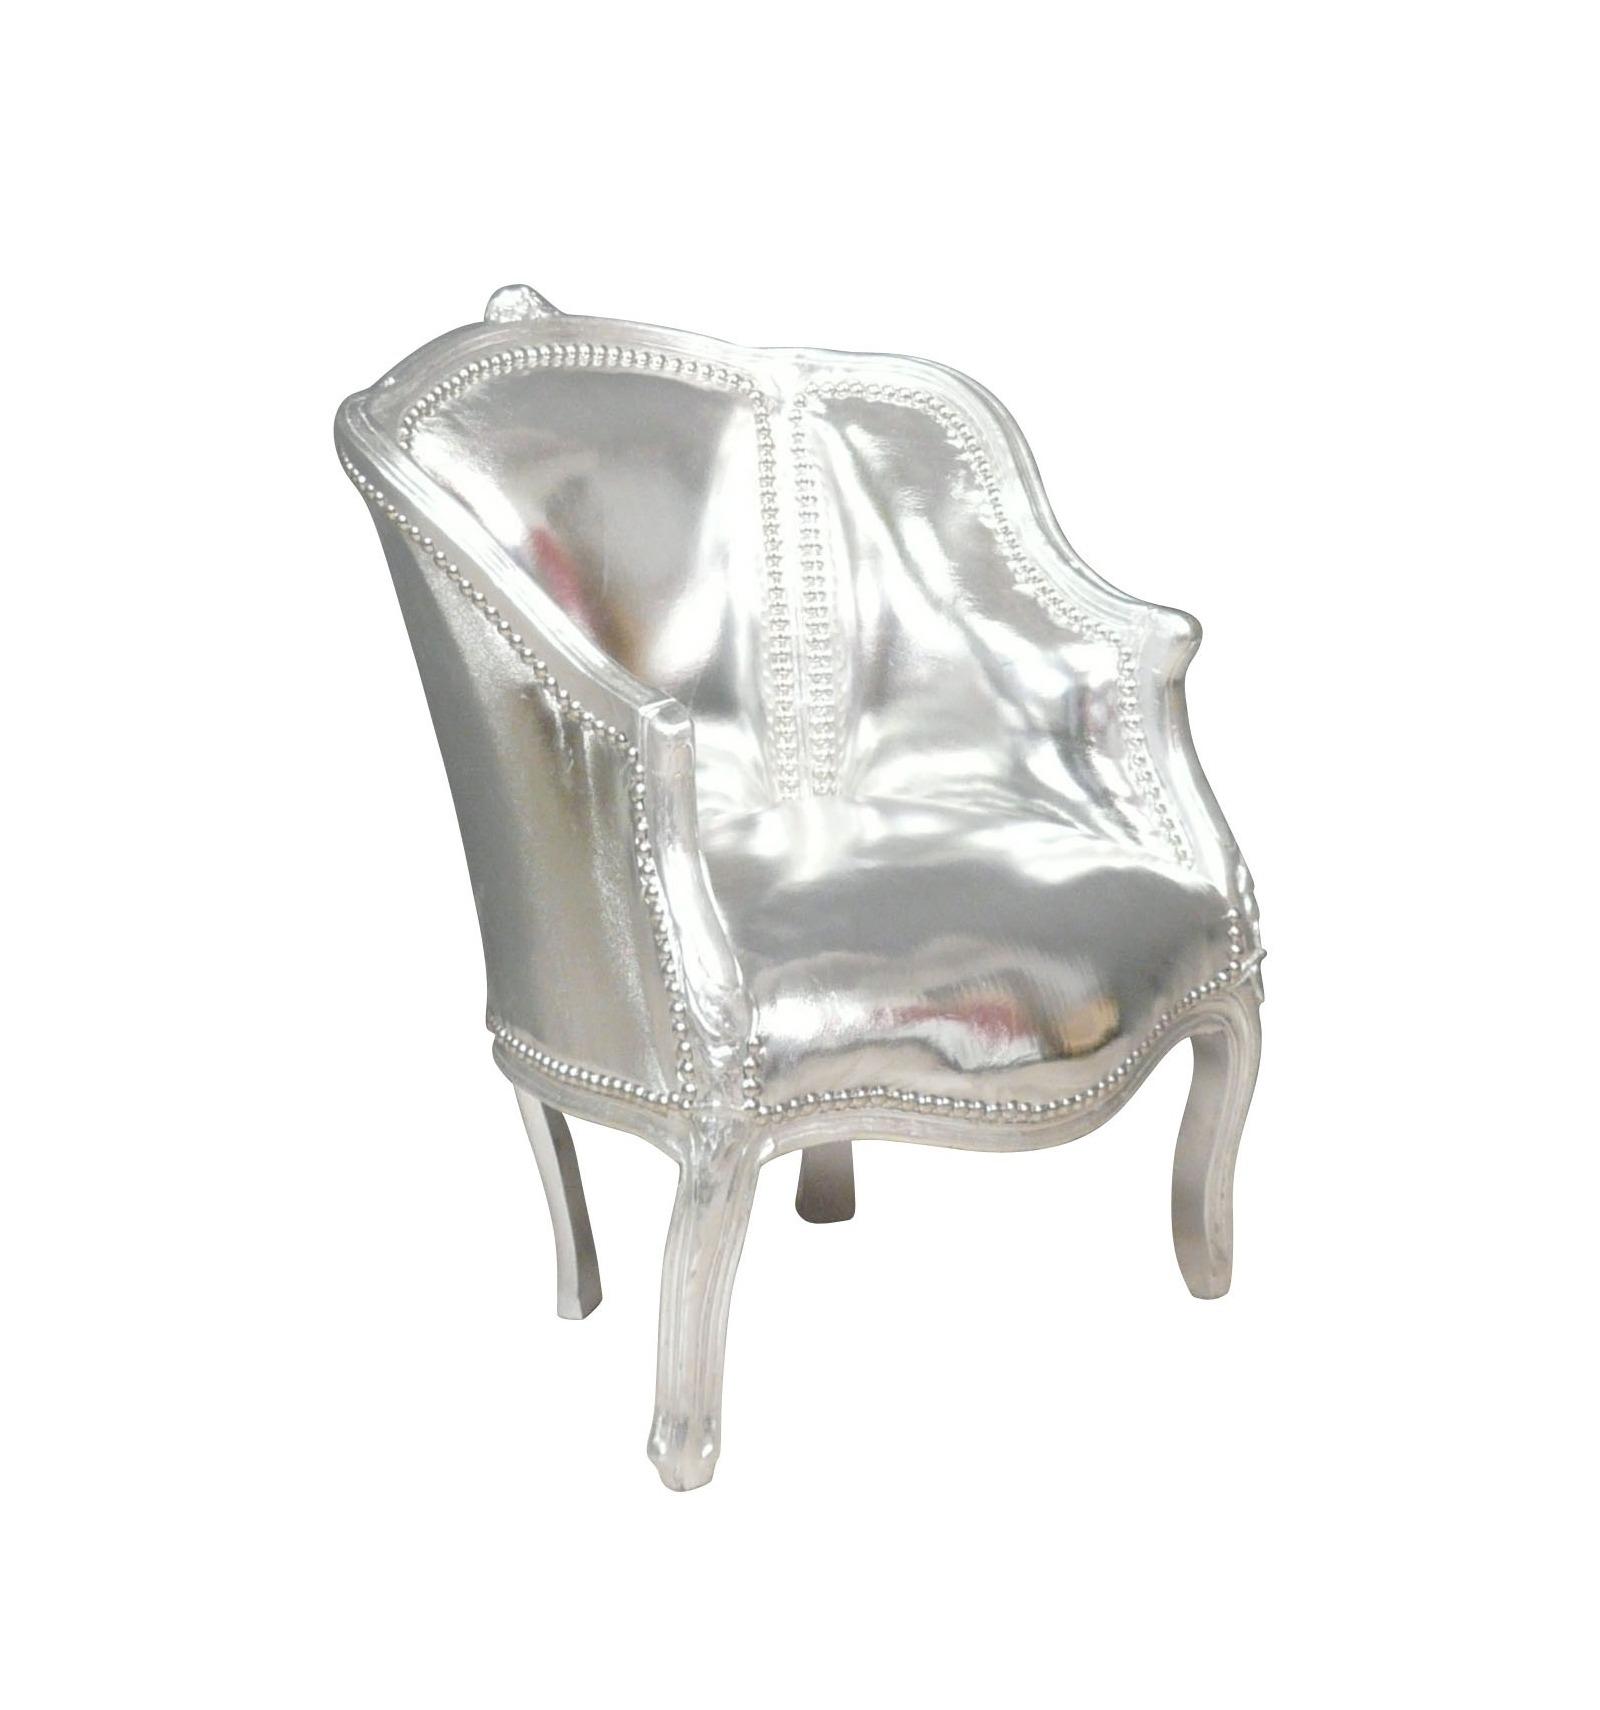 berg re baroque louis xv fauteuils louis xv. Black Bedroom Furniture Sets. Home Design Ideas